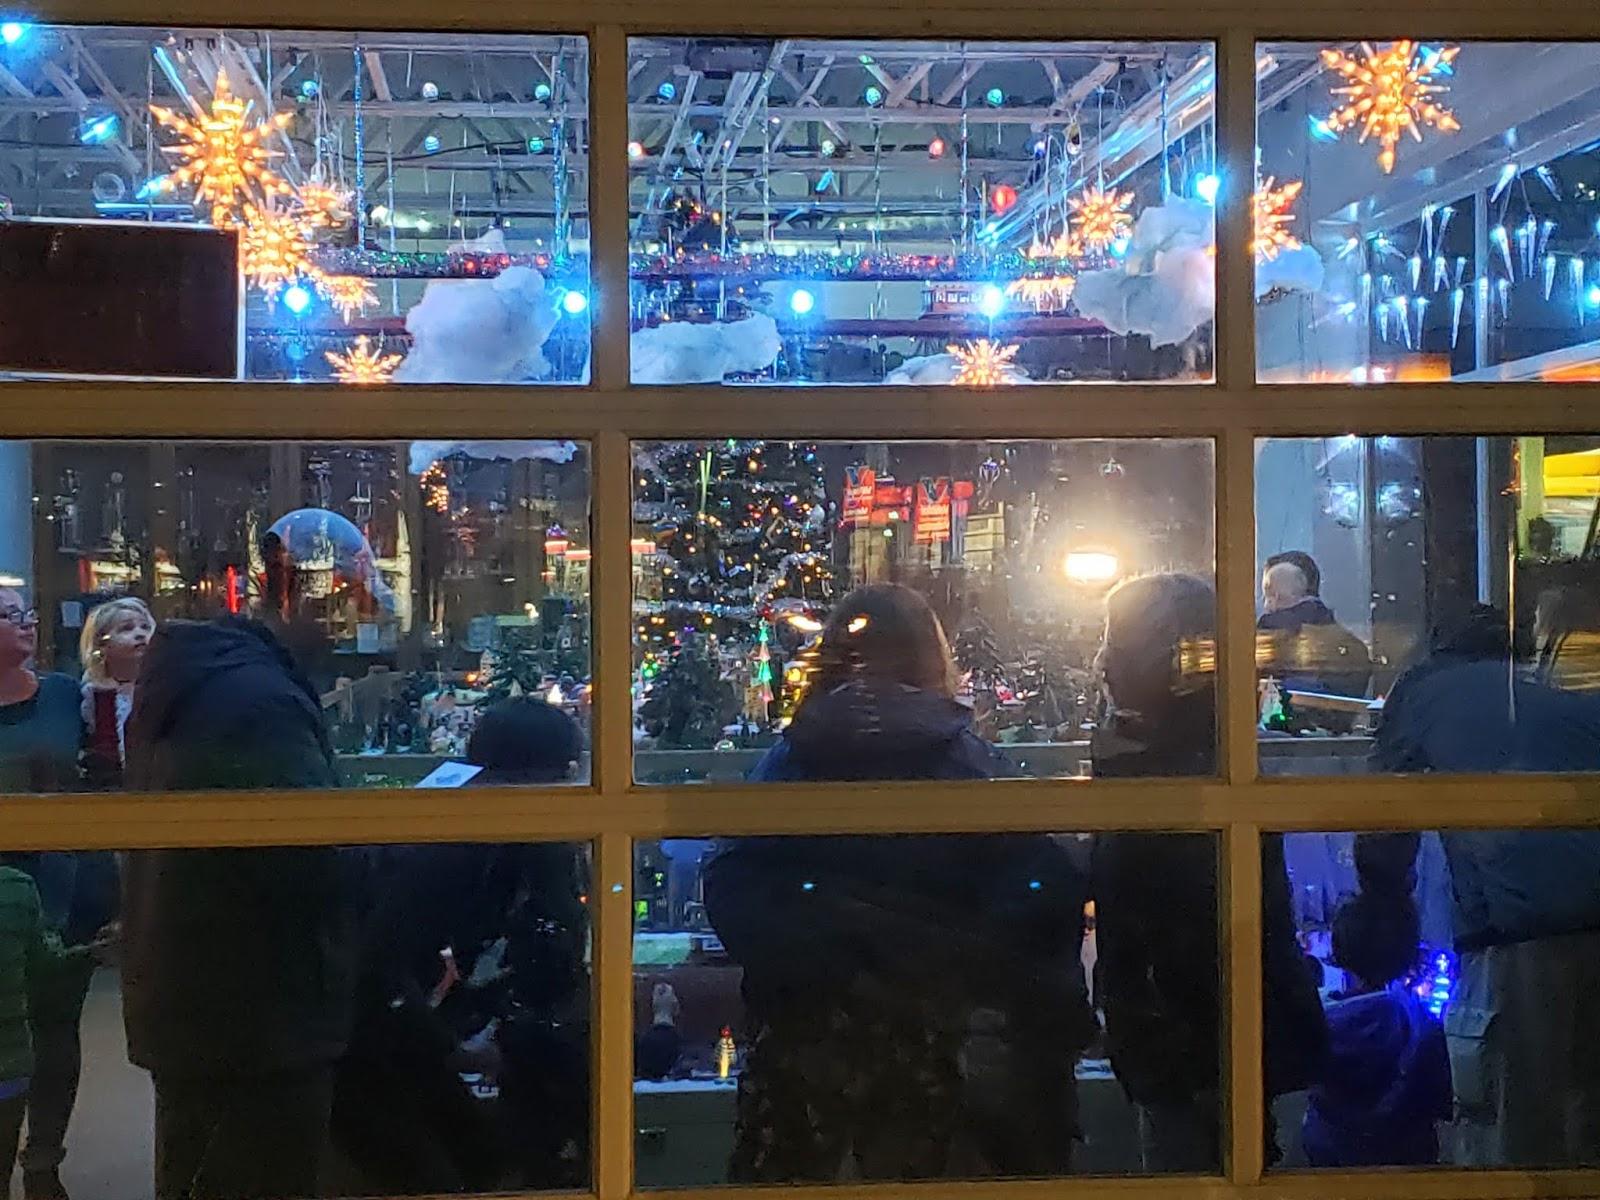 Glen Avenue Christmas Garden 2020 MidAtlantic DayTrips: The Simple Joy of a Christmas Train Garden